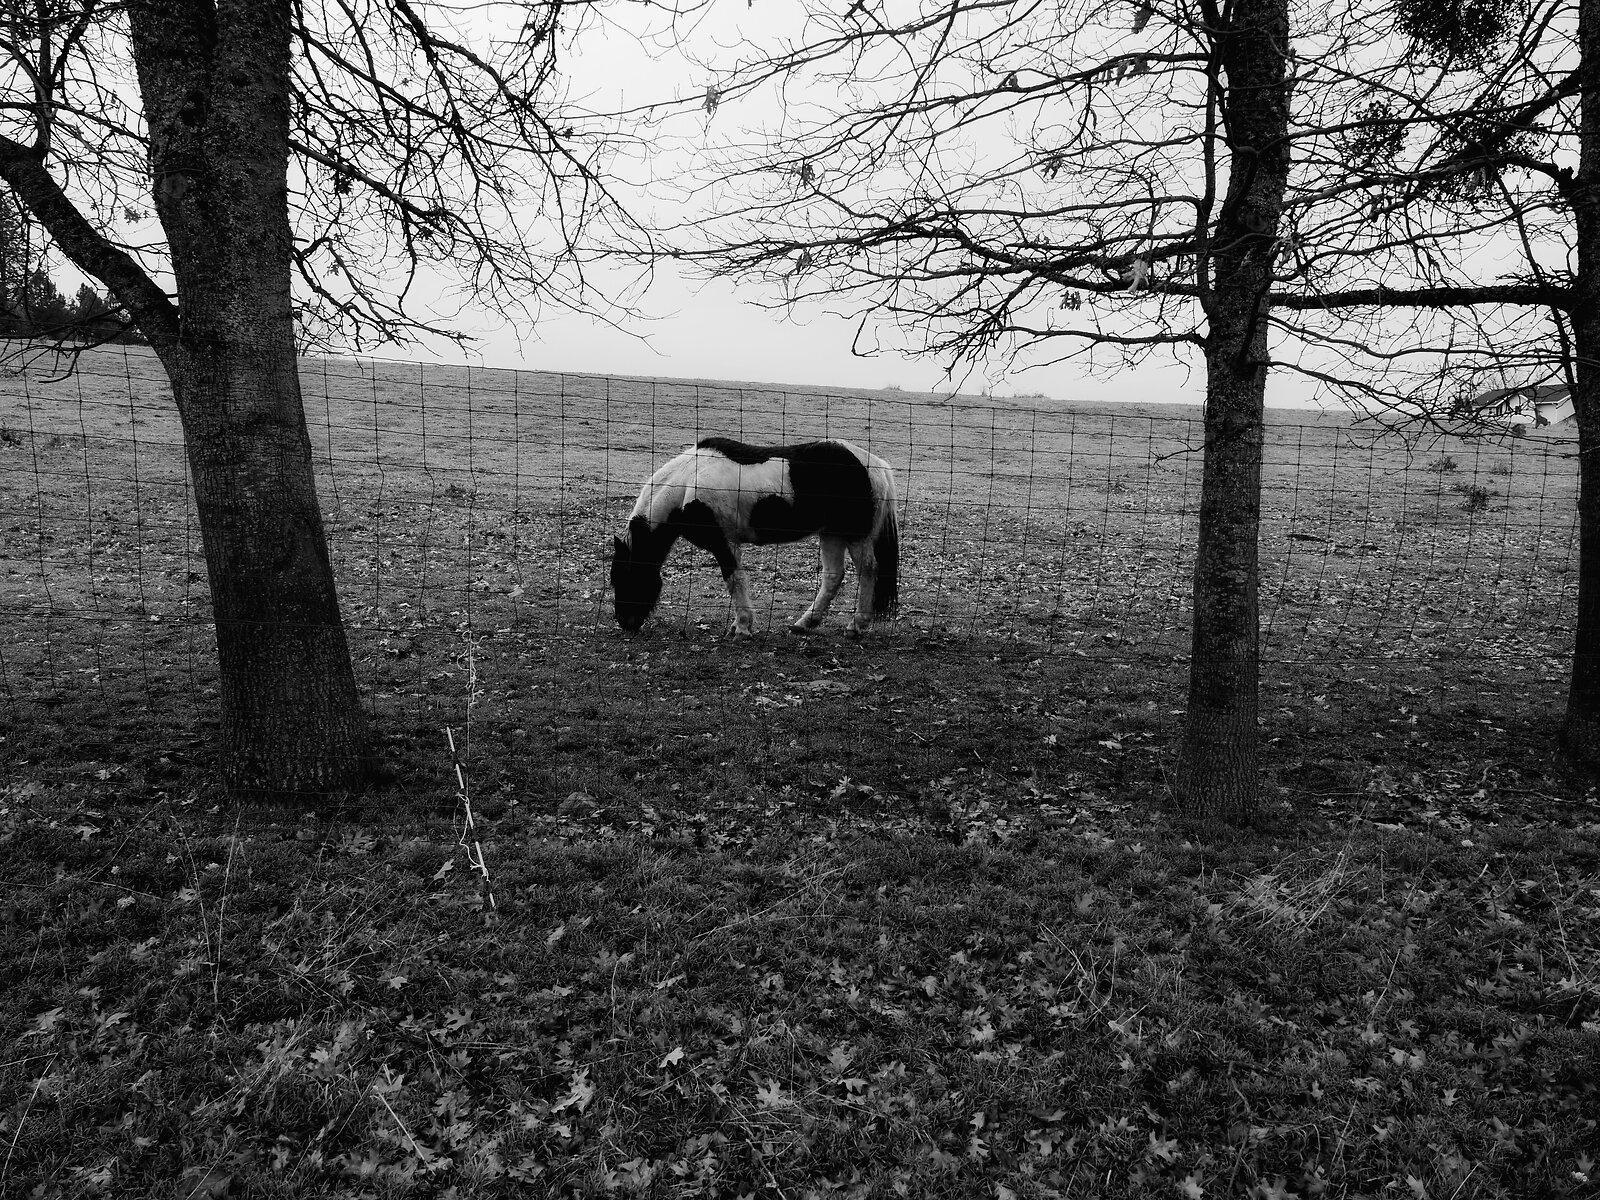 GX8_Jan18_21_horse+trees.jpg